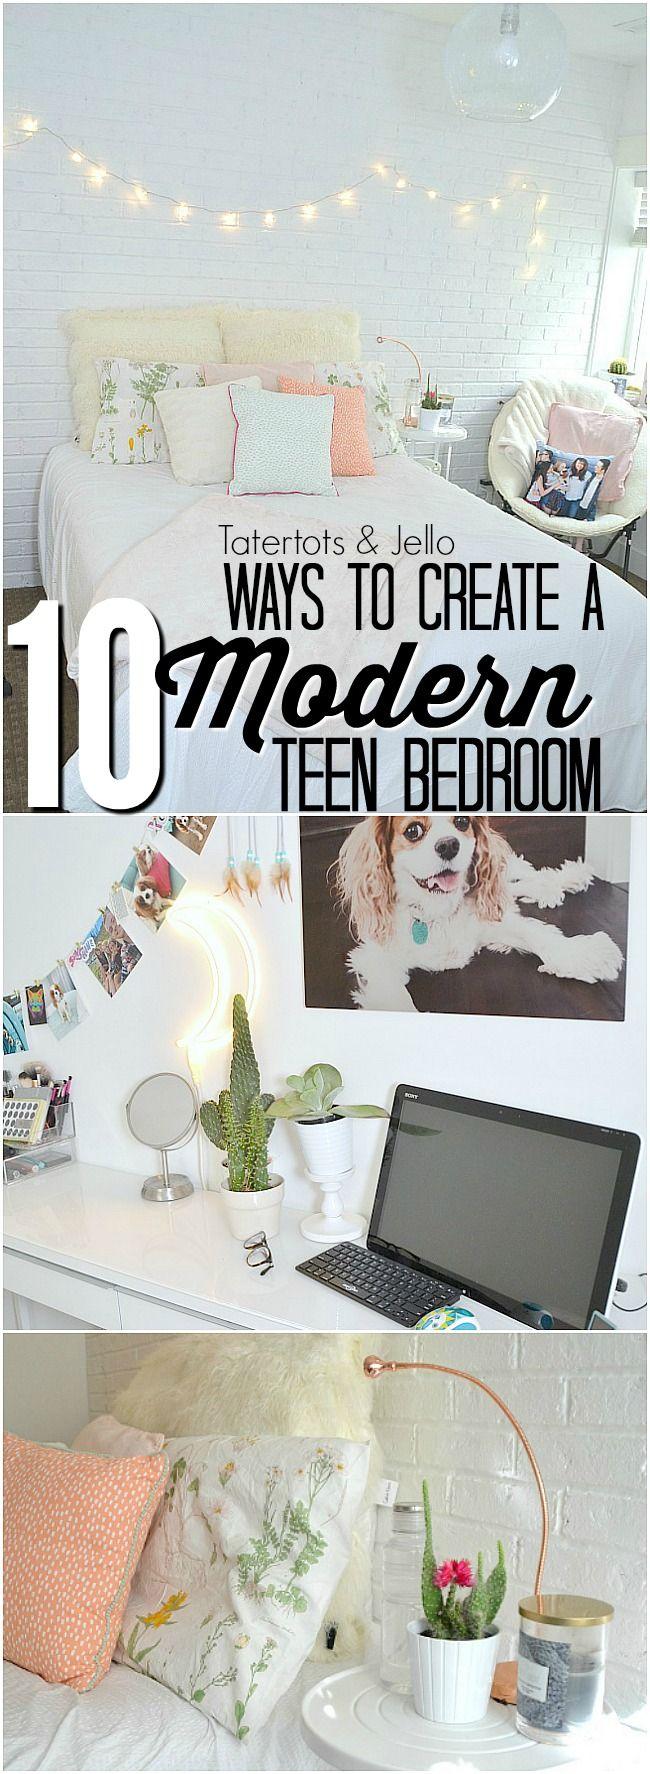 the 25 best modern teen bedrooms ideas on pinterest modern teen 10 ways to create a modern teen bedroom